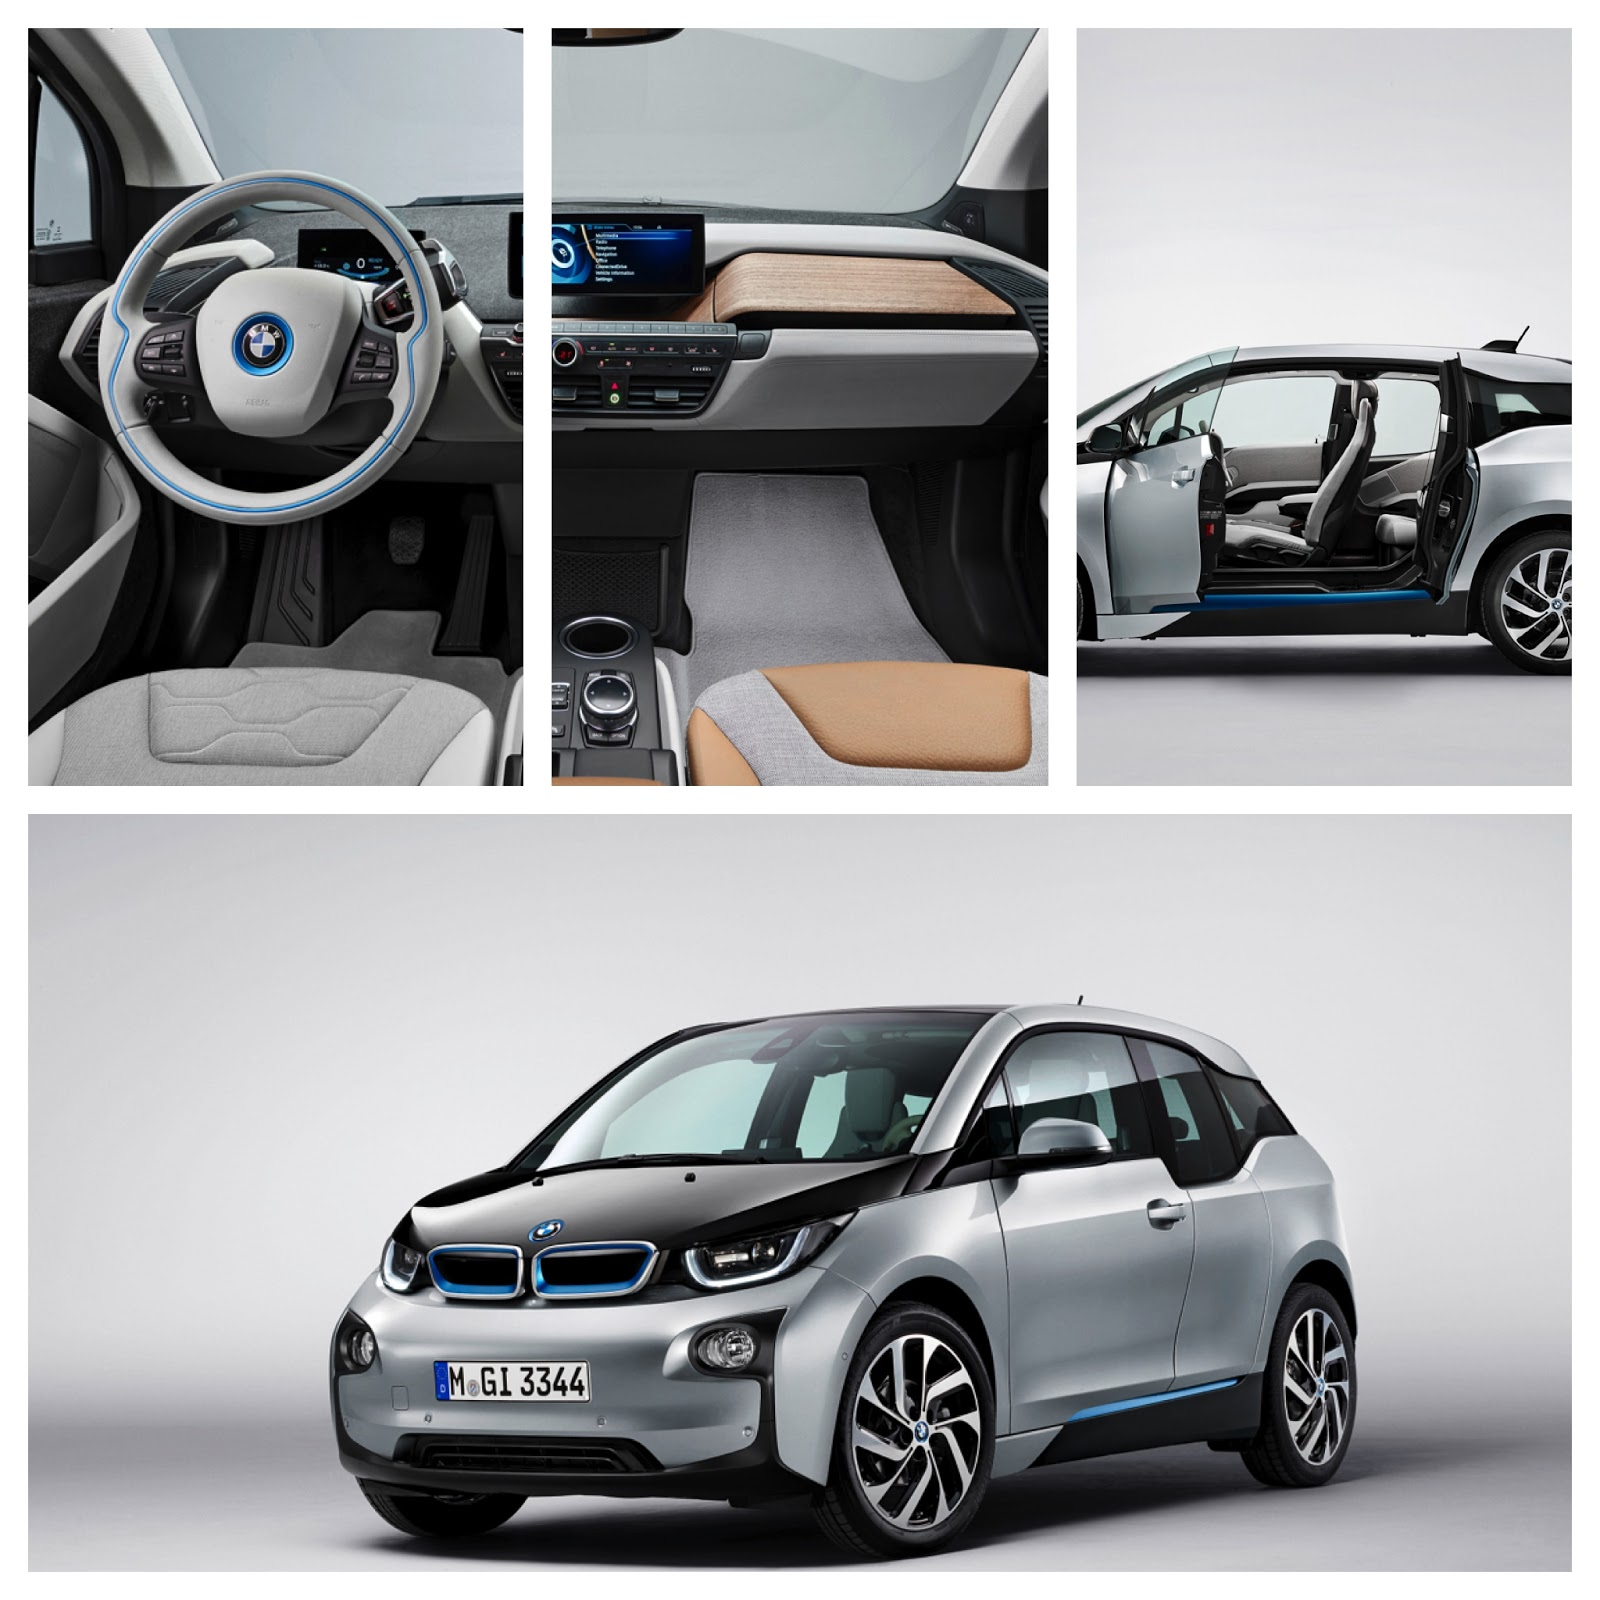 Electric BMW - Cars & Life